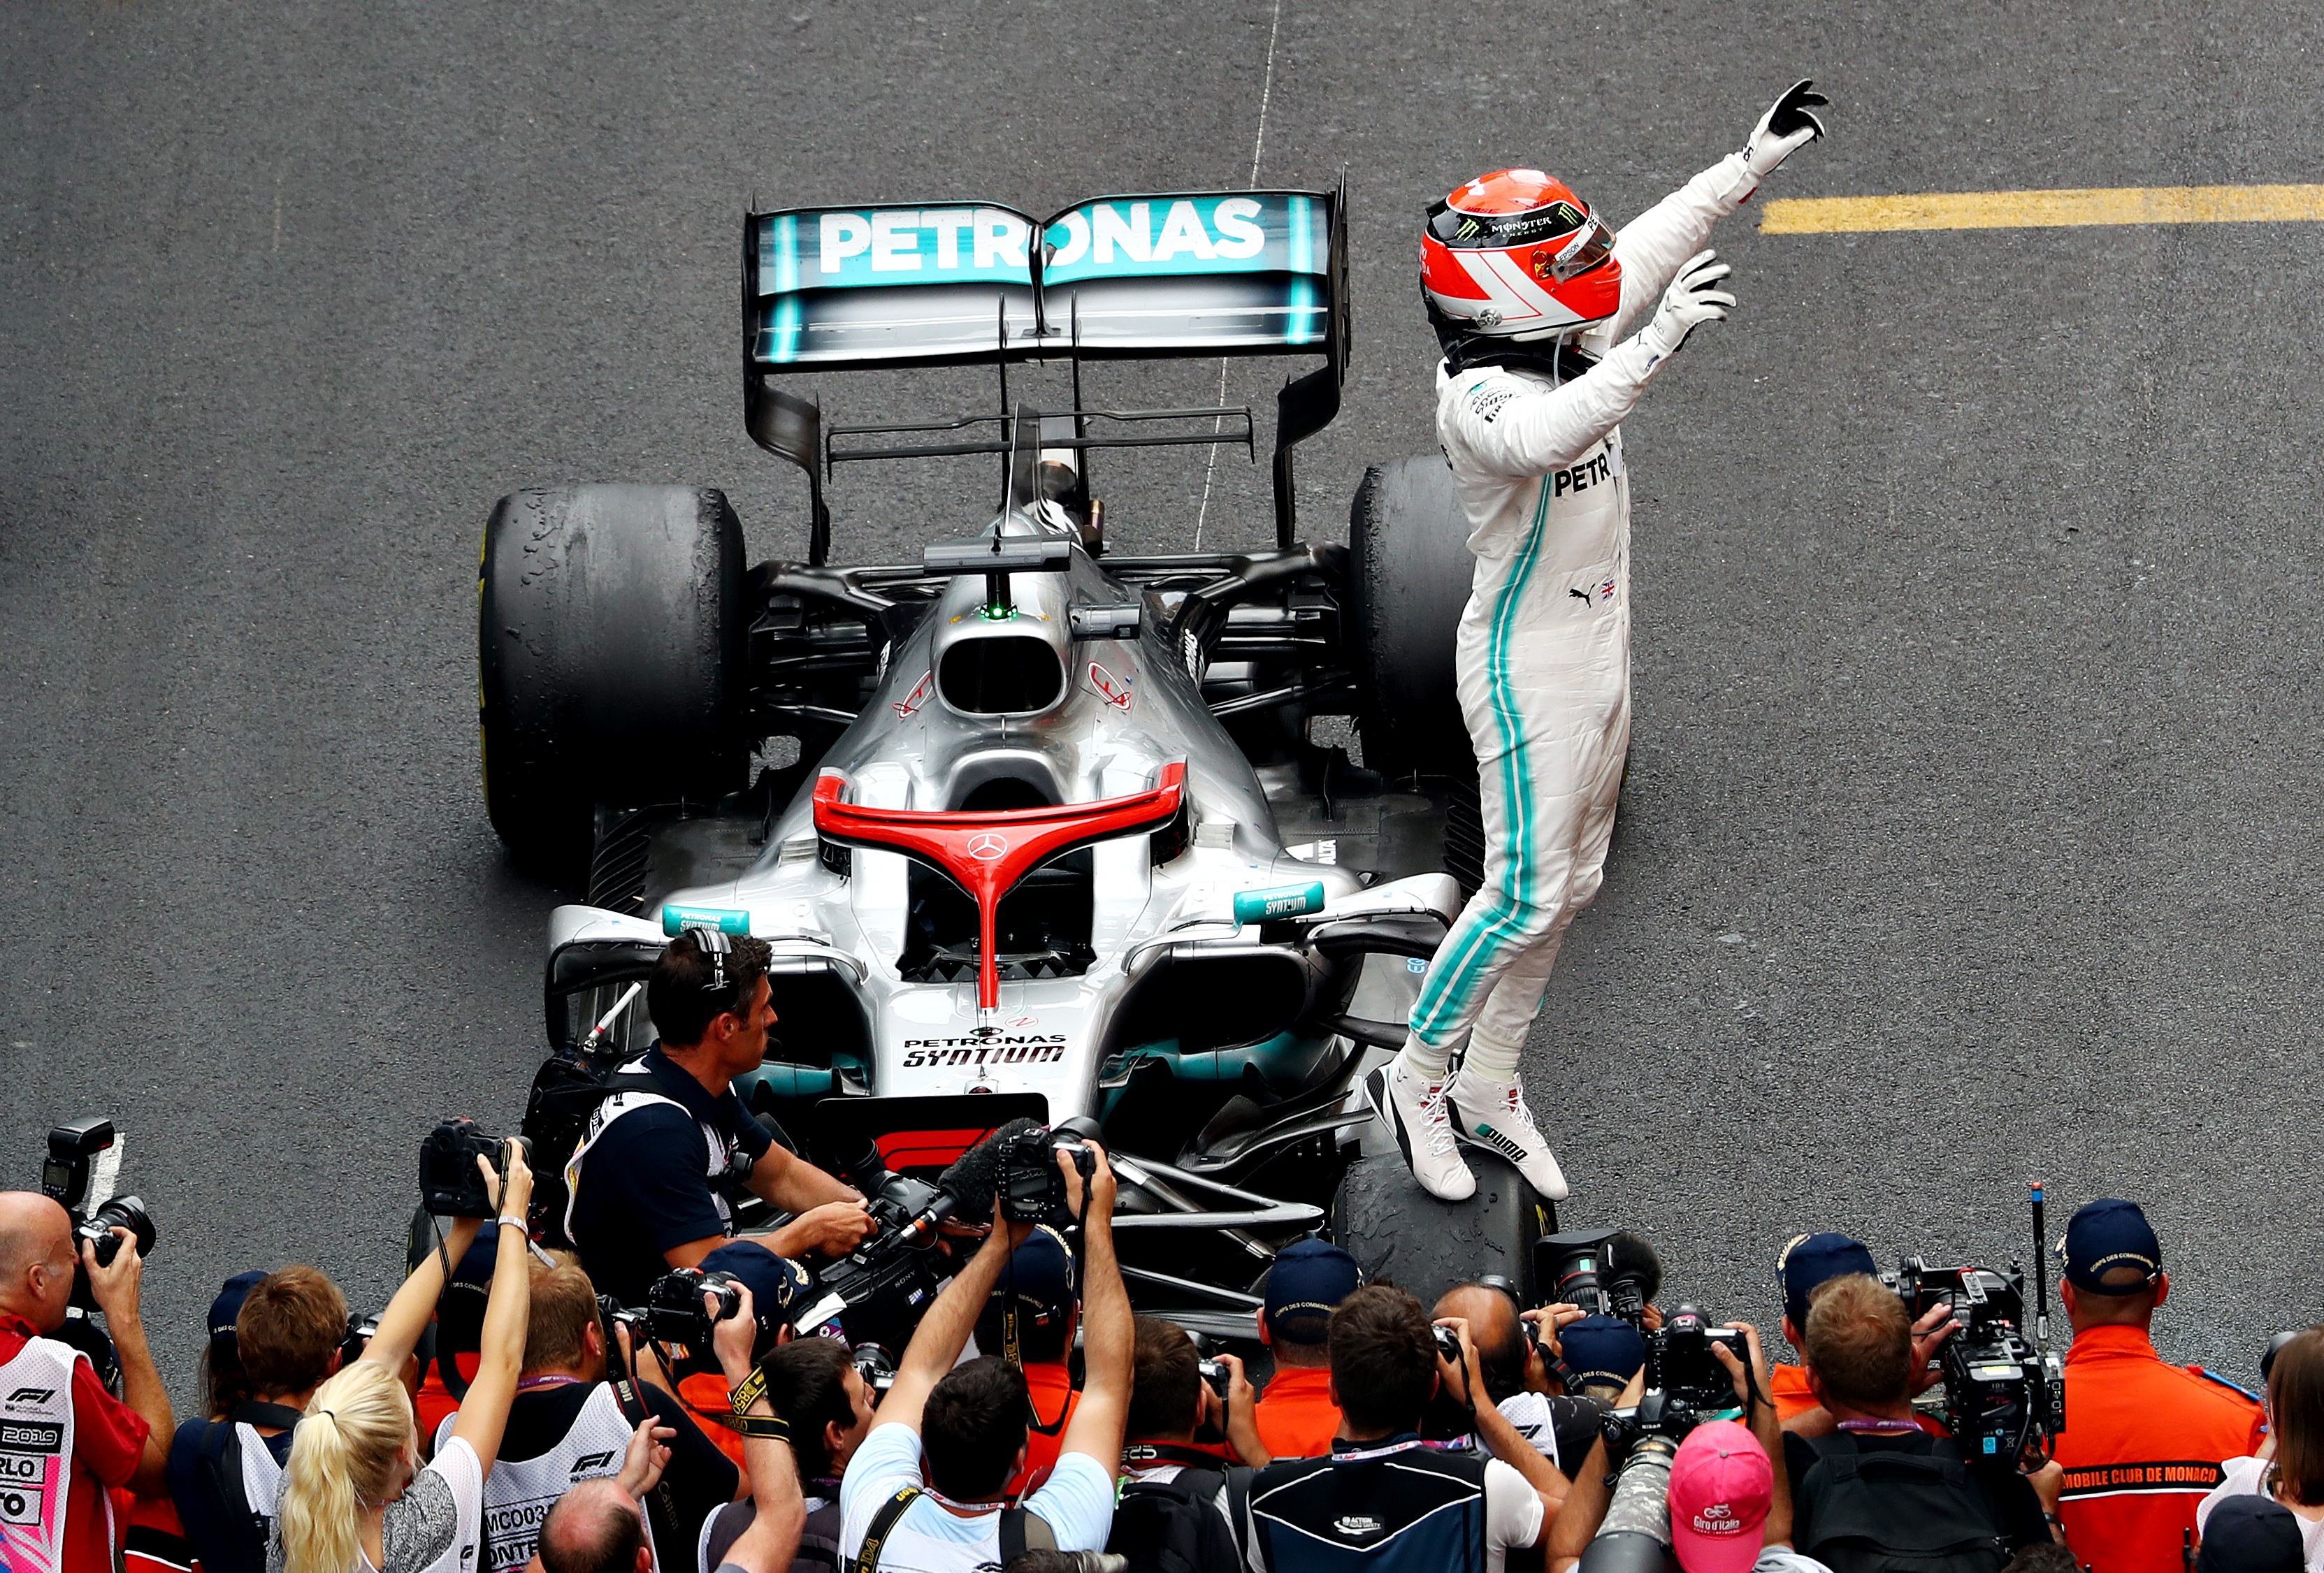 Race winner Lewis Hamilton of Great Britain and Mercedes GP celebrates in parc ferme during the F1 Grand Prix of Monaco at Circuit de Monaco.